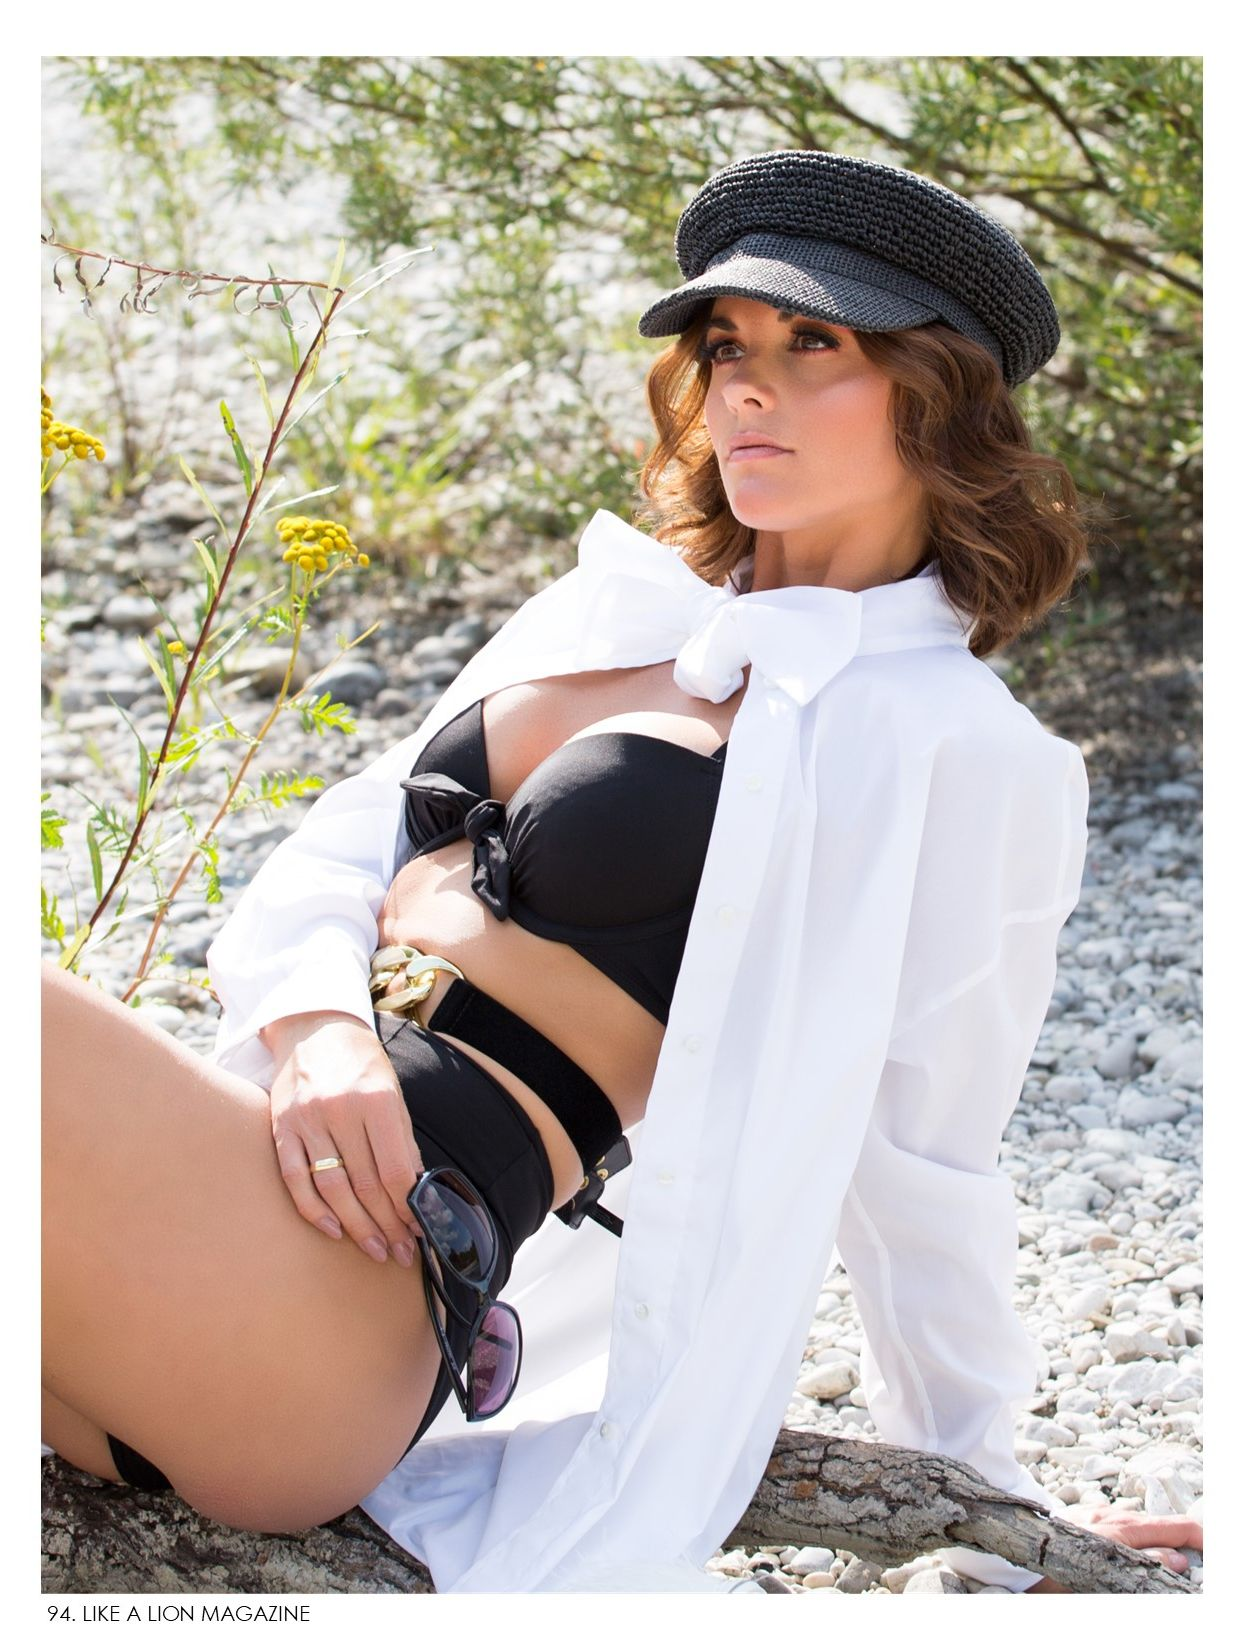 LIKE A LION, June 2021 Vol. 3 - Fashion Stylist: Vesna Resch